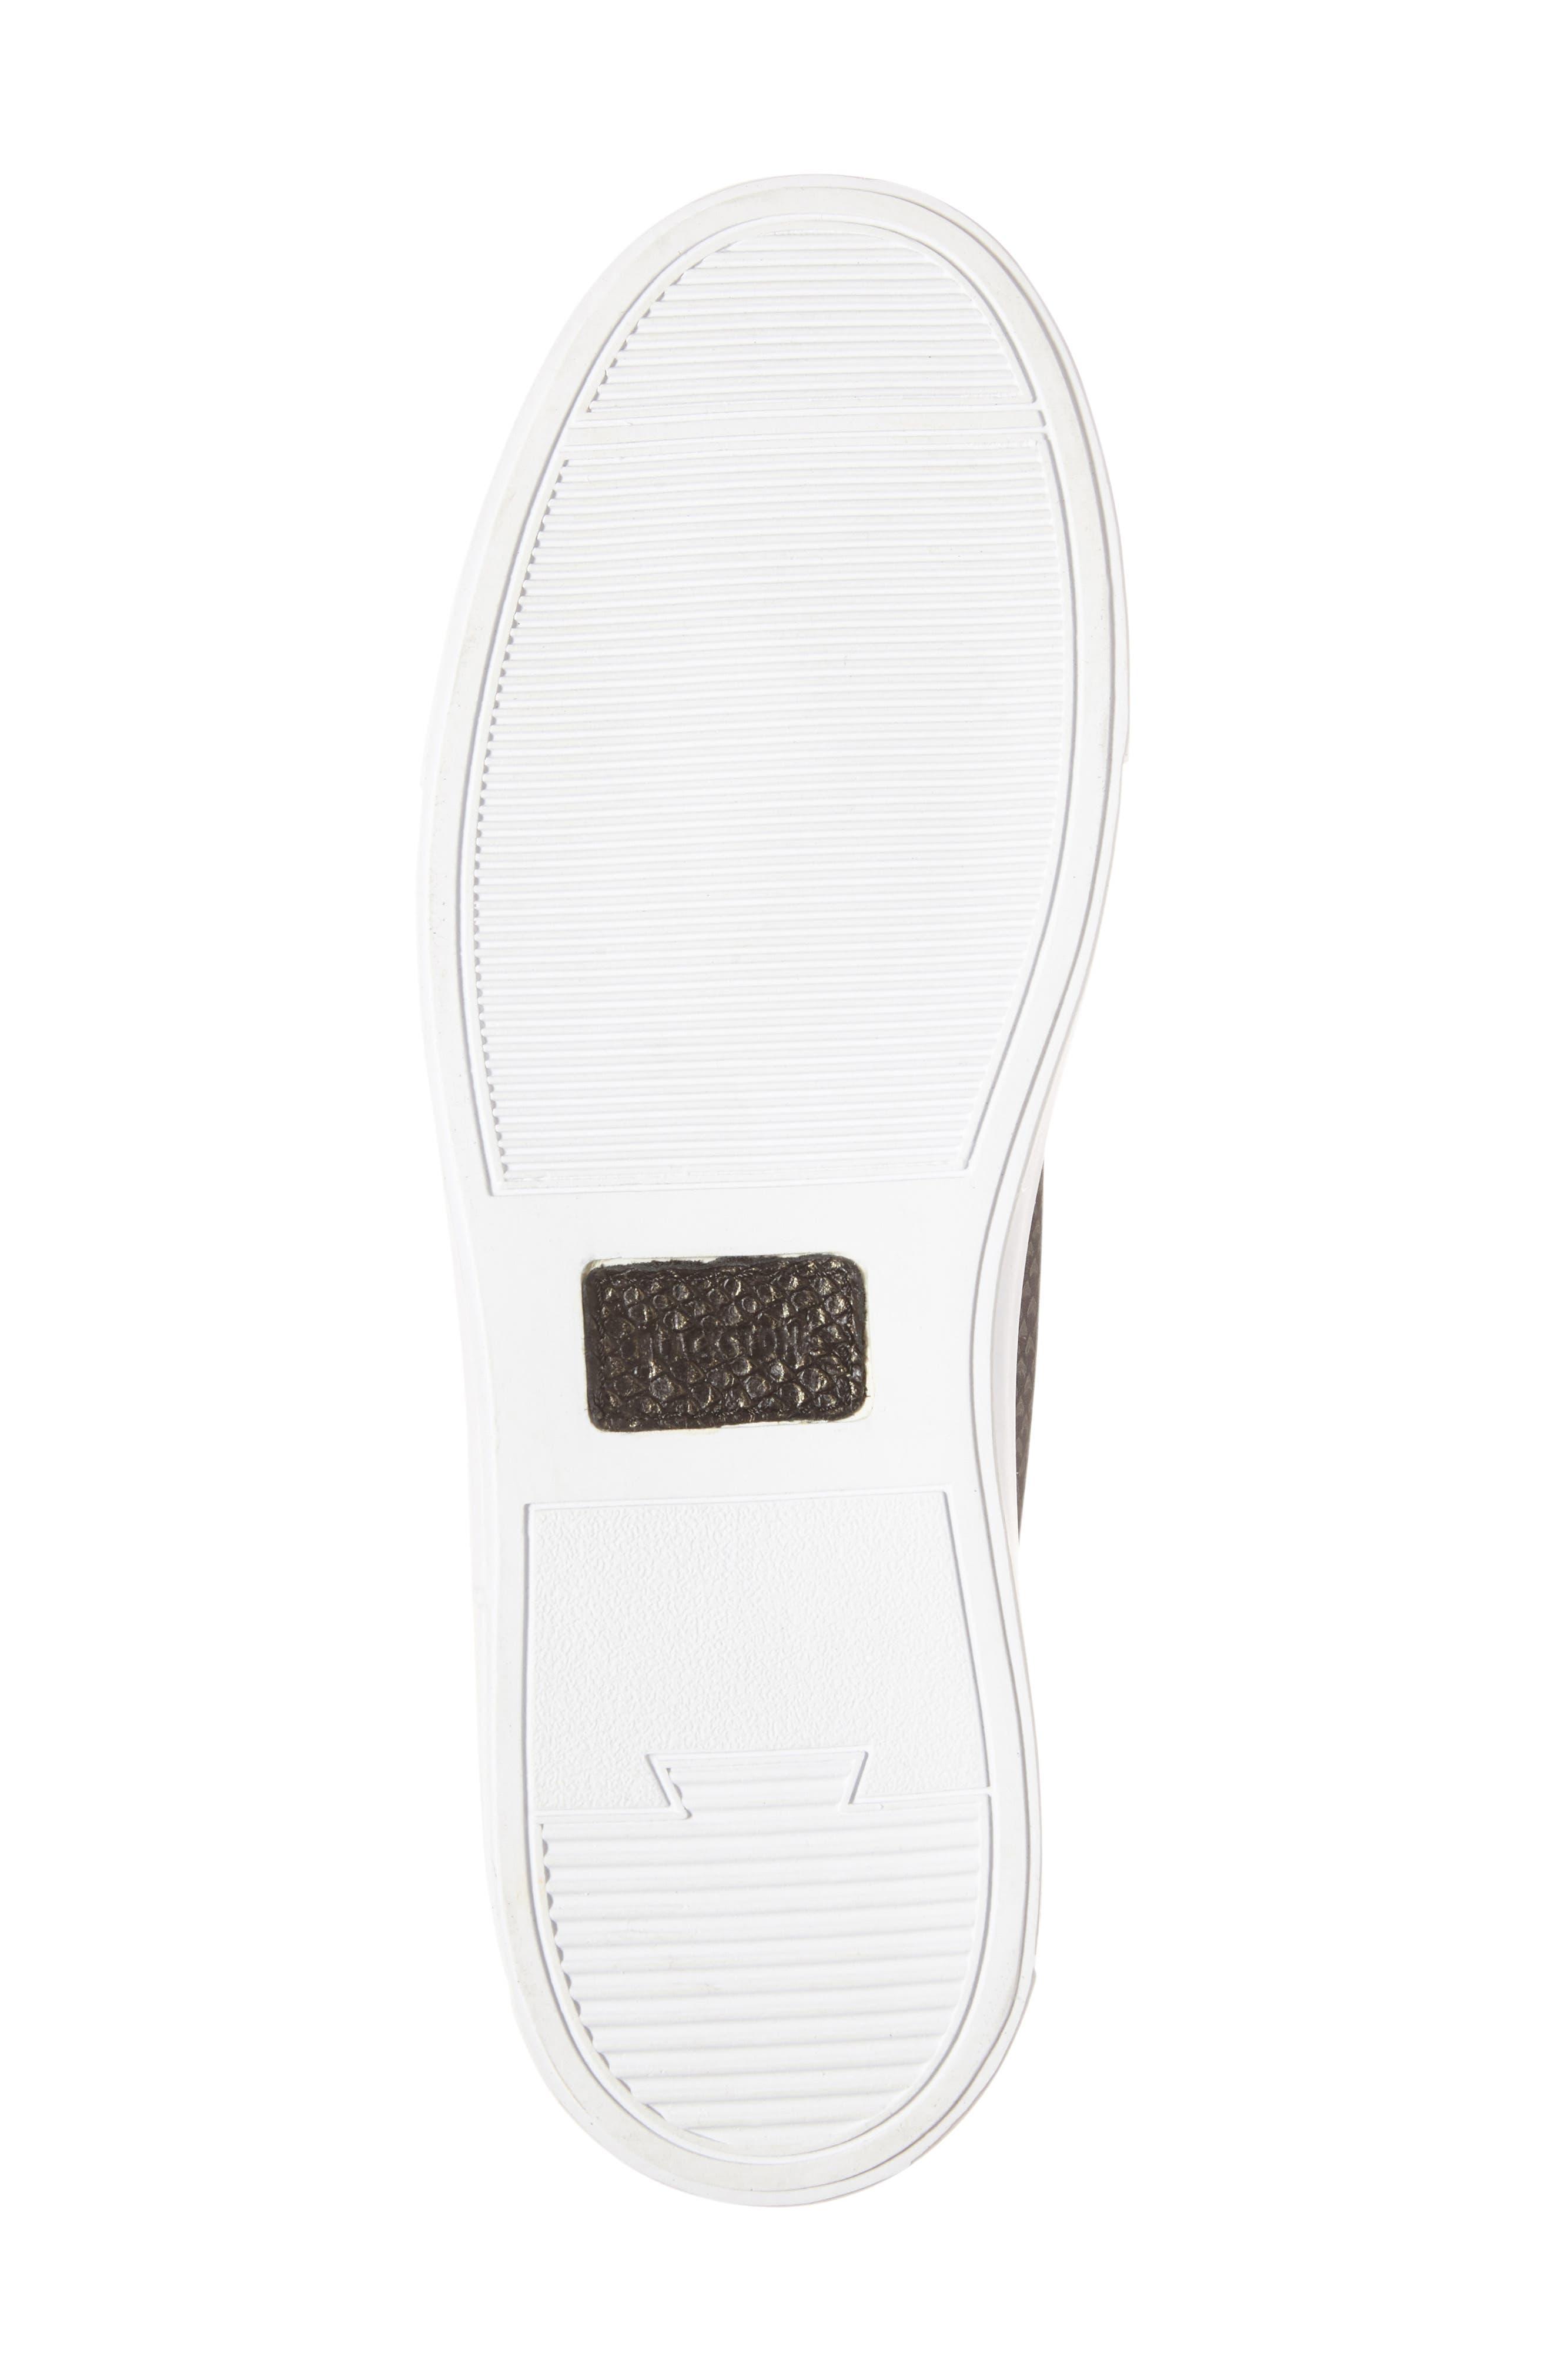 NL28 Midi Sneaker,                             Alternate thumbnail 4, color,                             001